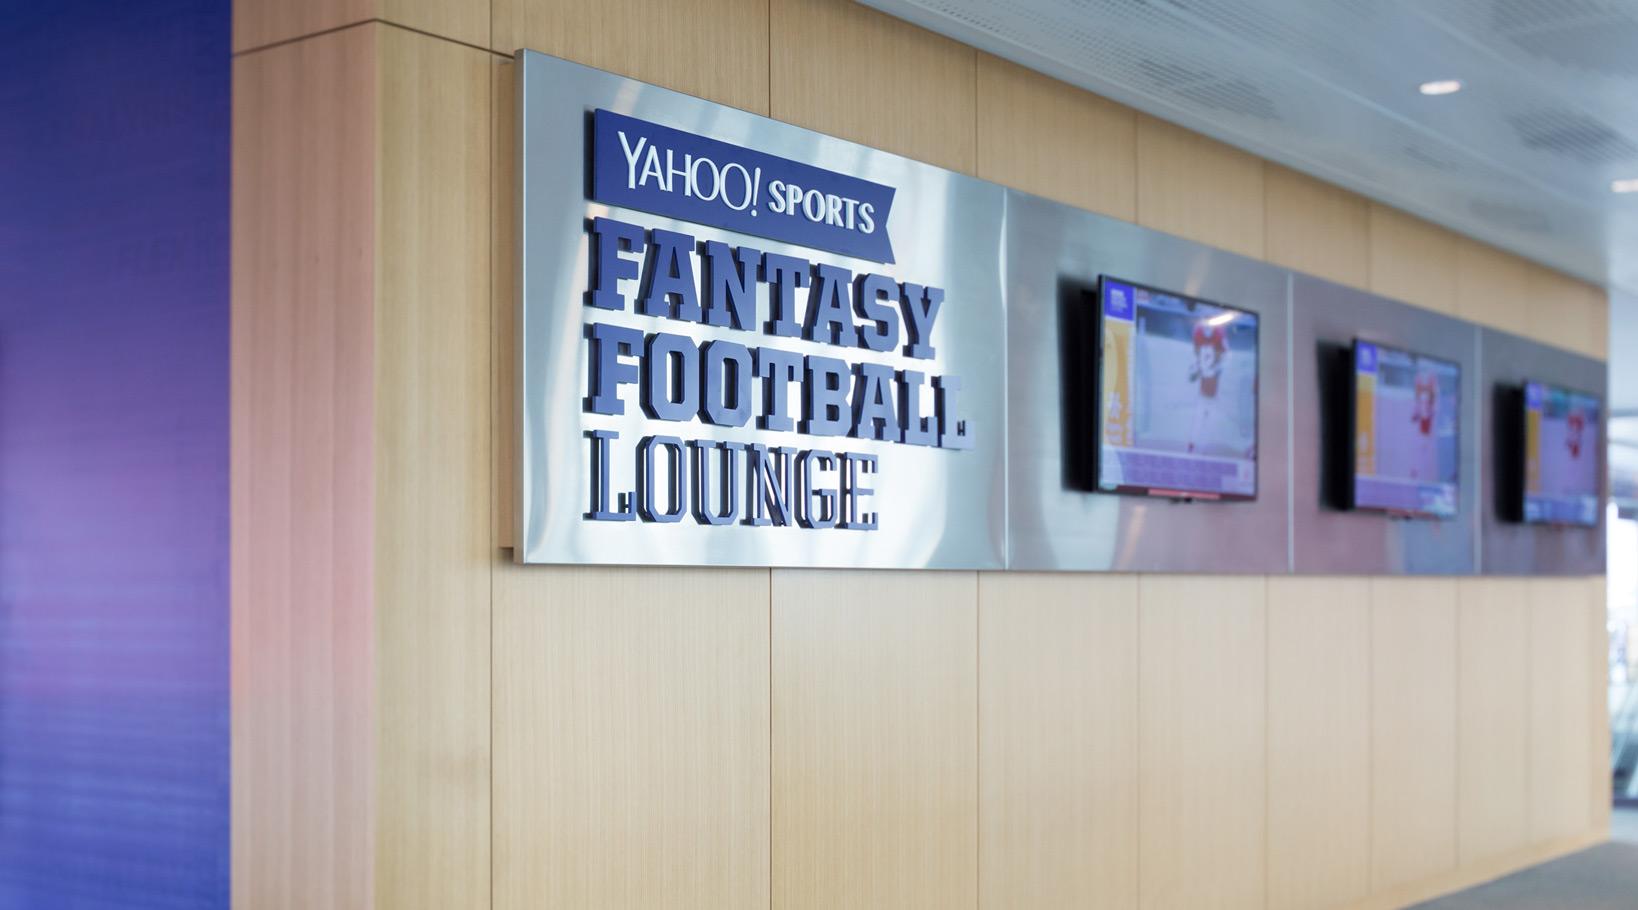 Yahoo Fantasy Football Lounge Design